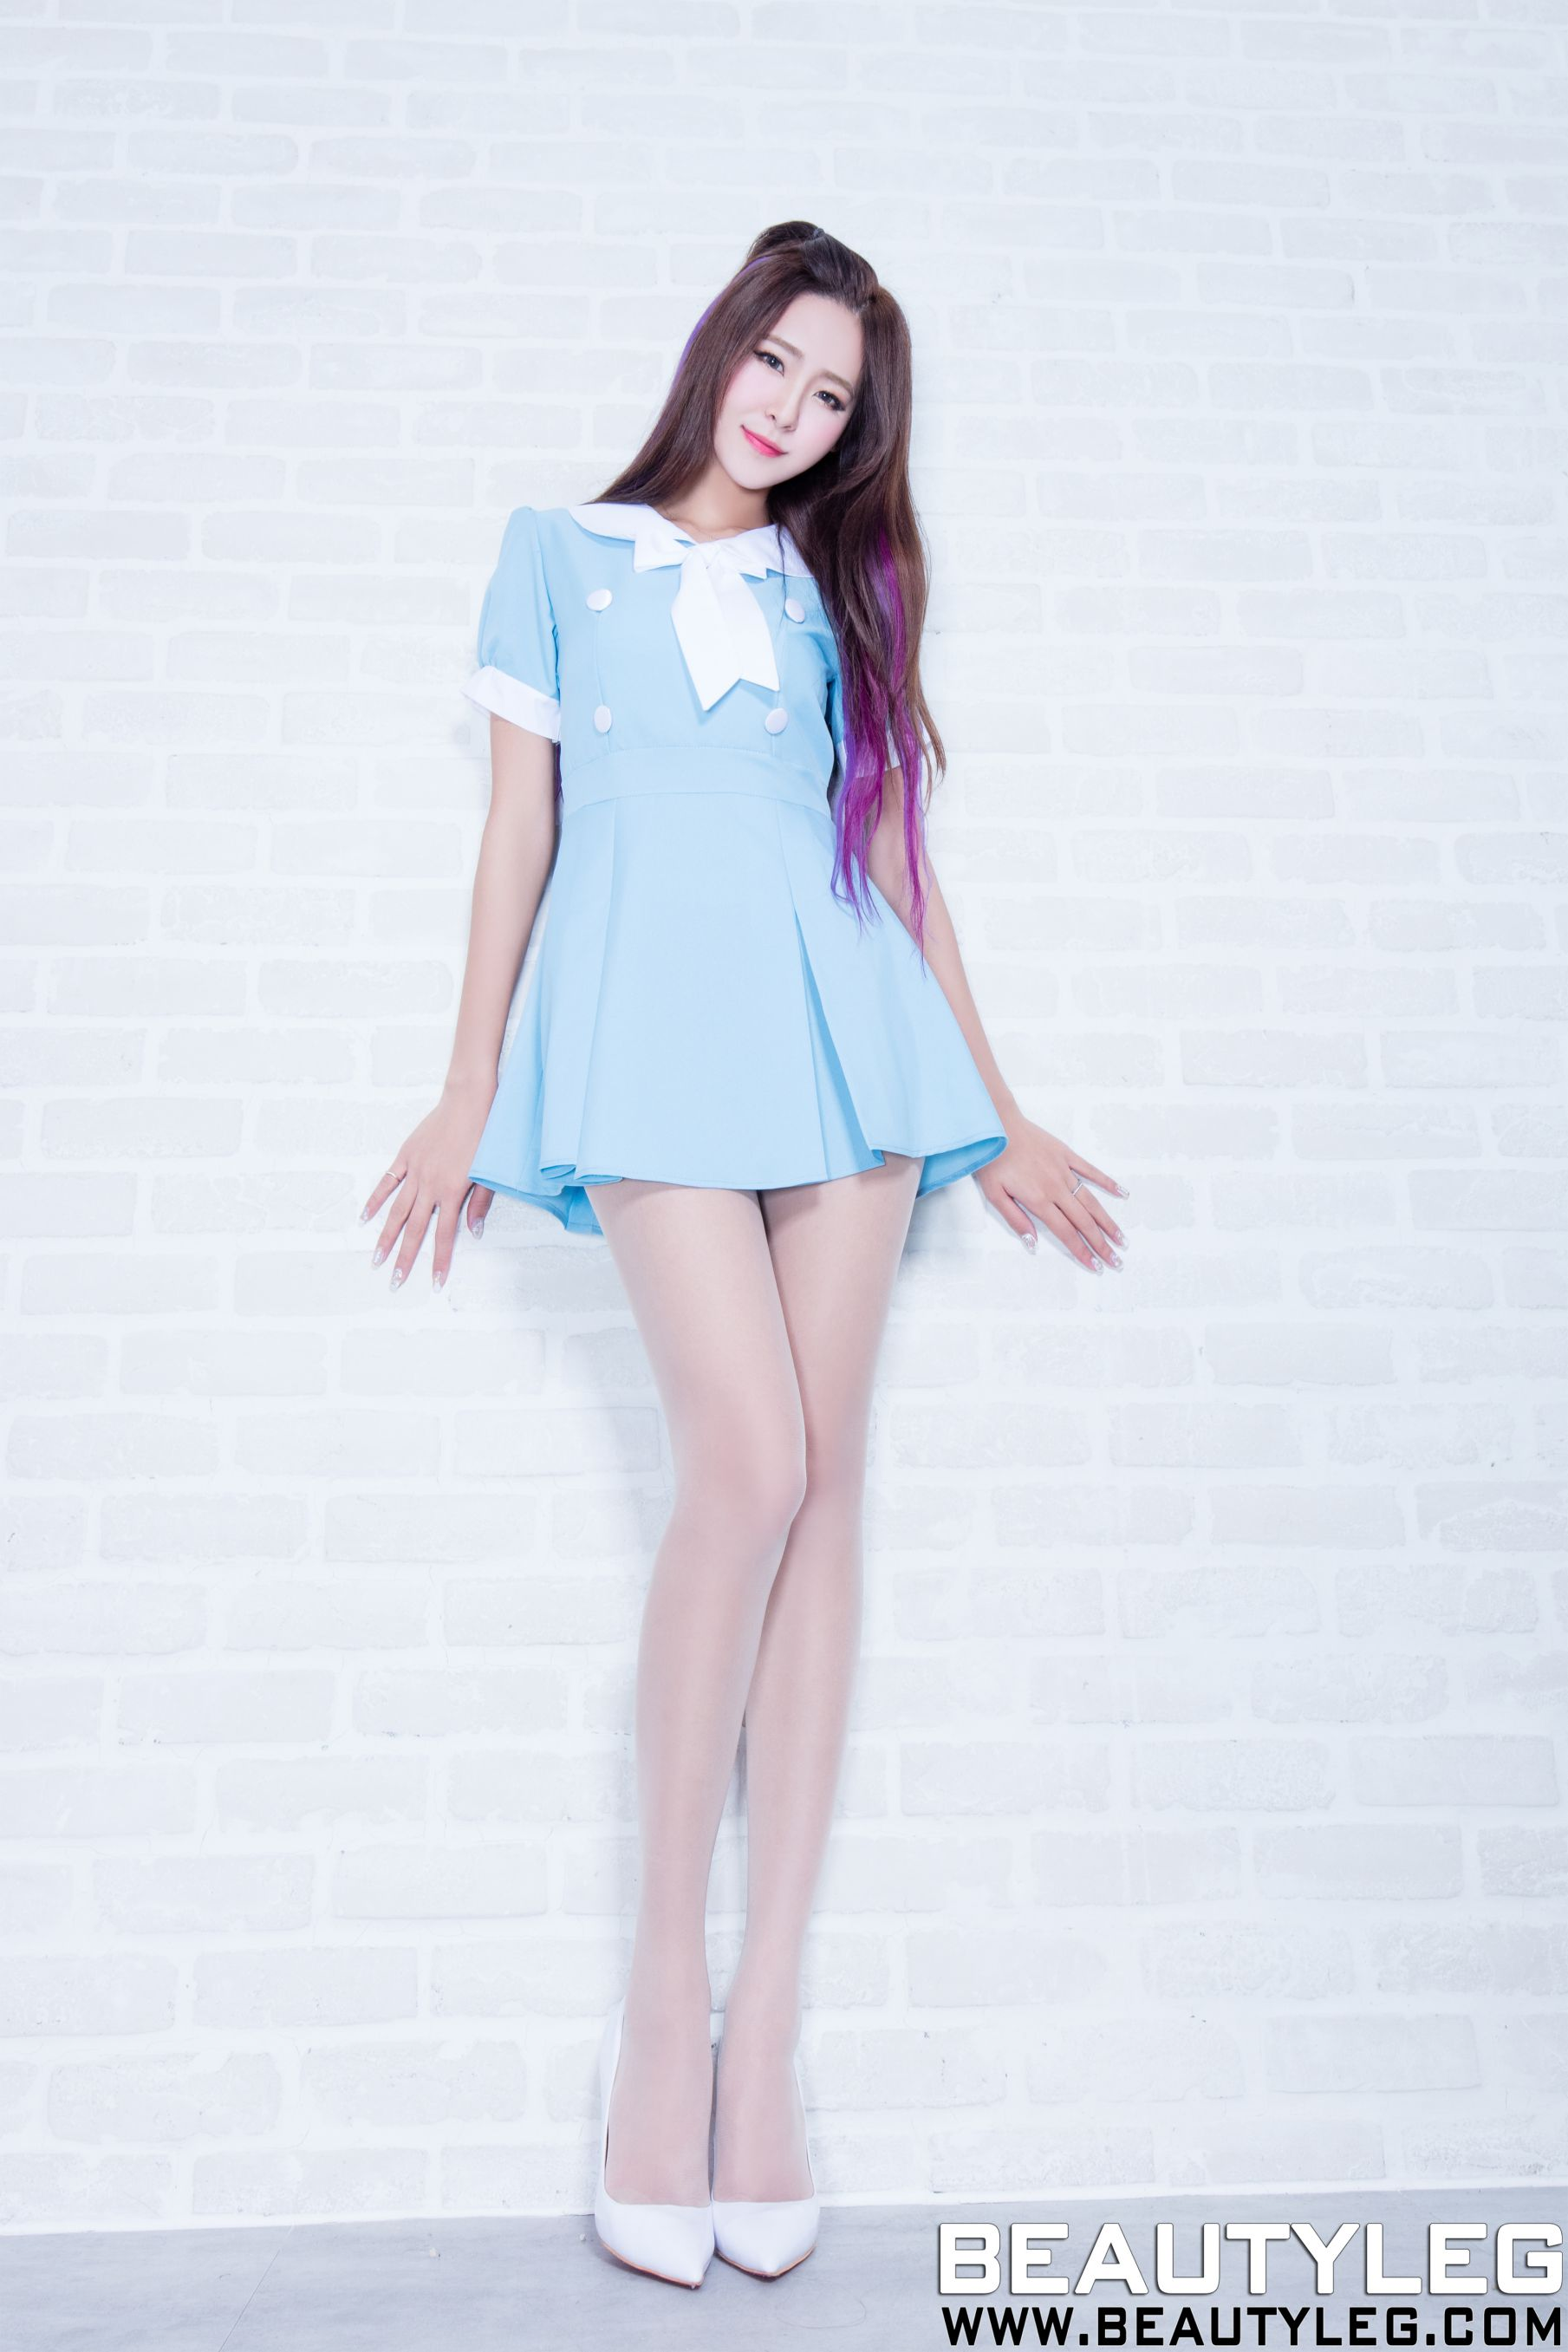 VOL.157 [Beautyleg]美腿豹纹美女长发美女:Winnie小雪(庄咏惠,庄温妮,腿模Winnie)高品质写真套图(54P)